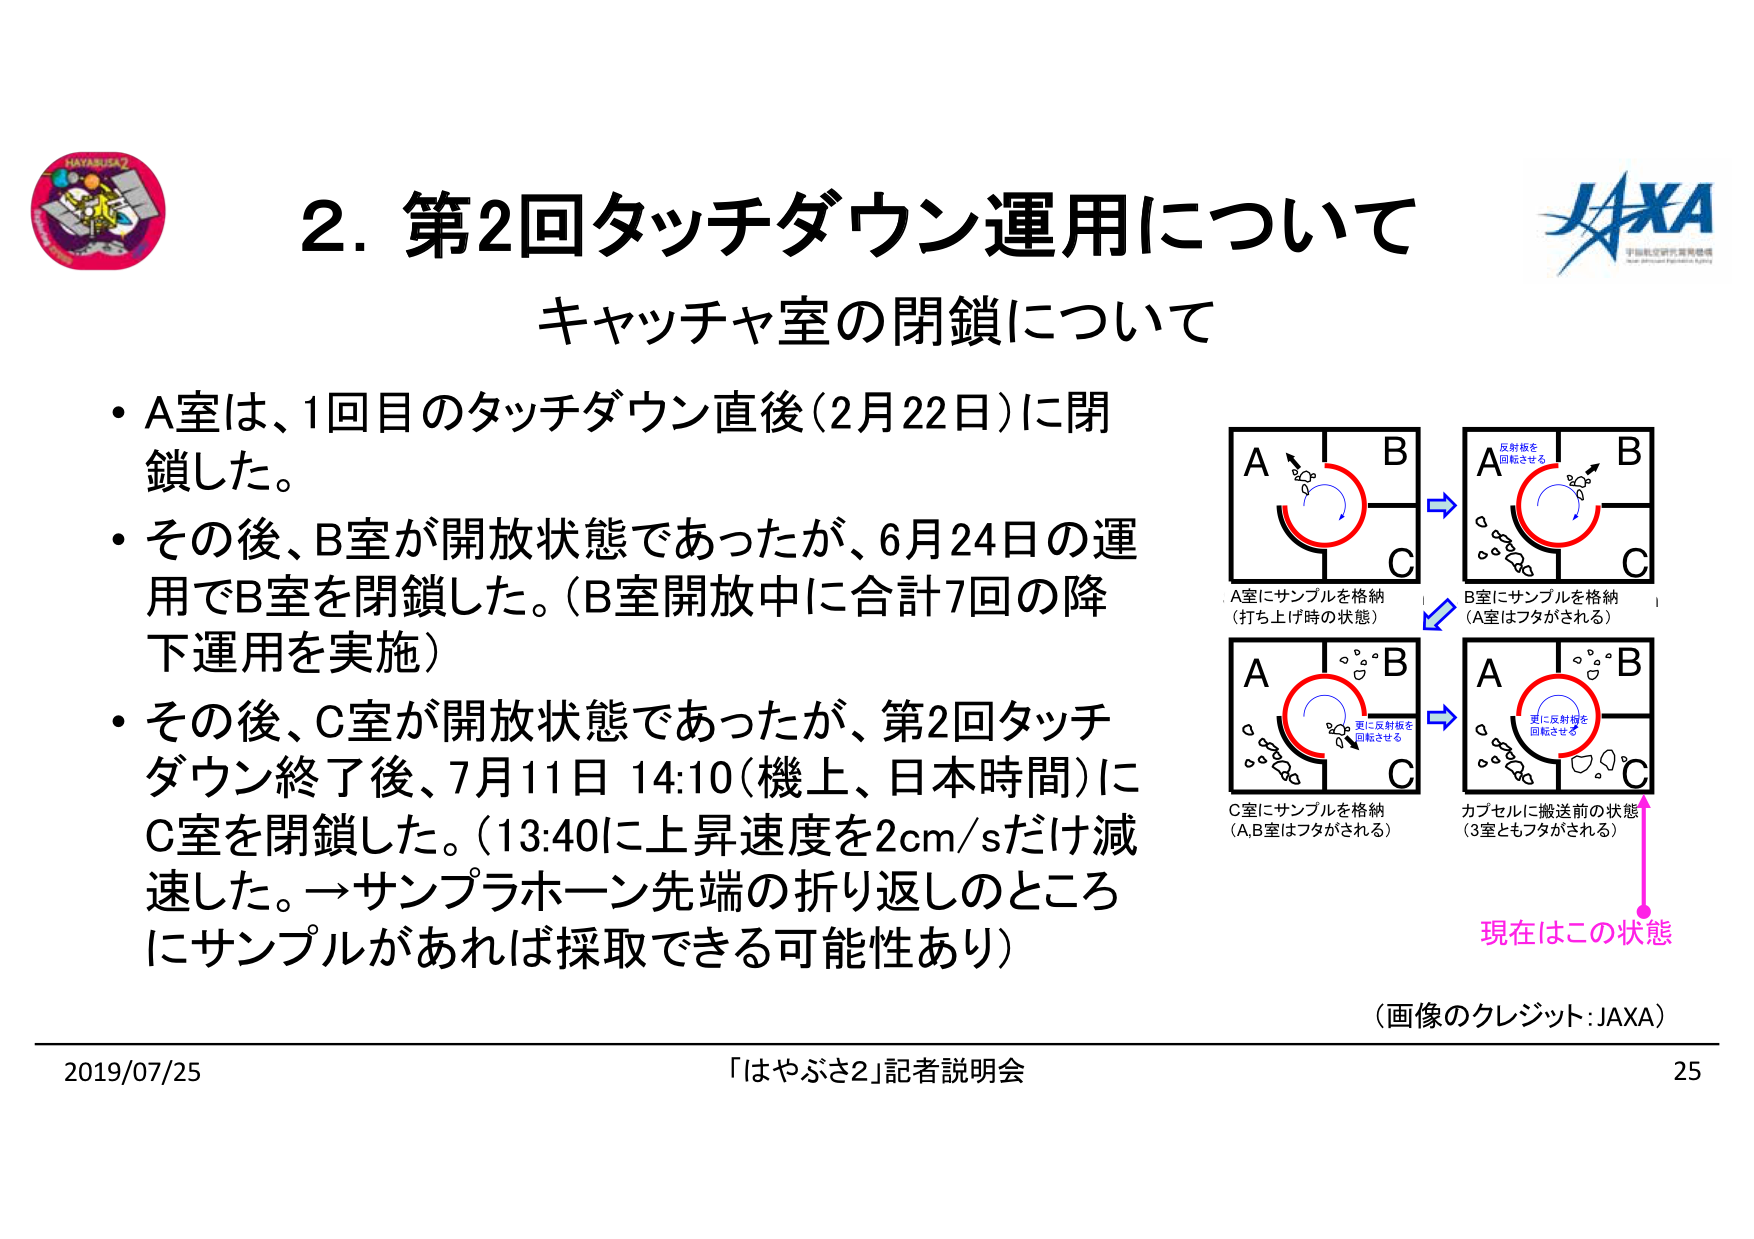 f:id:Imamura:20190725151320p:plain